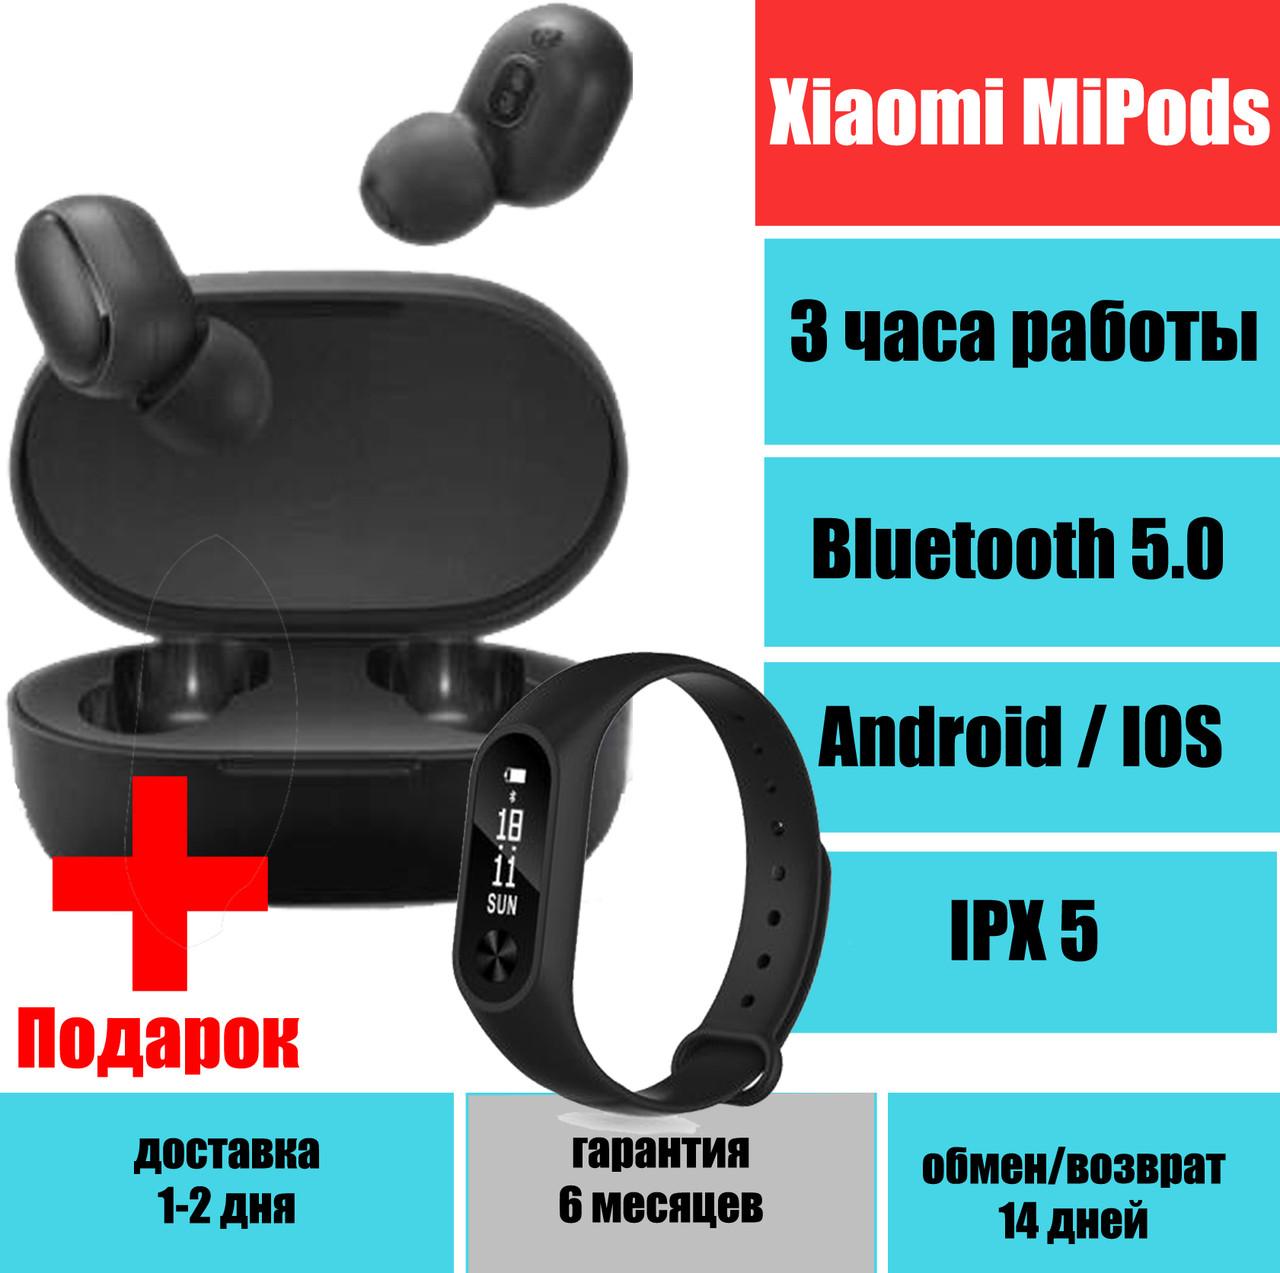 Наушники Xiaomi Redmi MiPods A6s TWS Блютуз Стерео Гарнитура QualitiReplica + Подарок M2 band